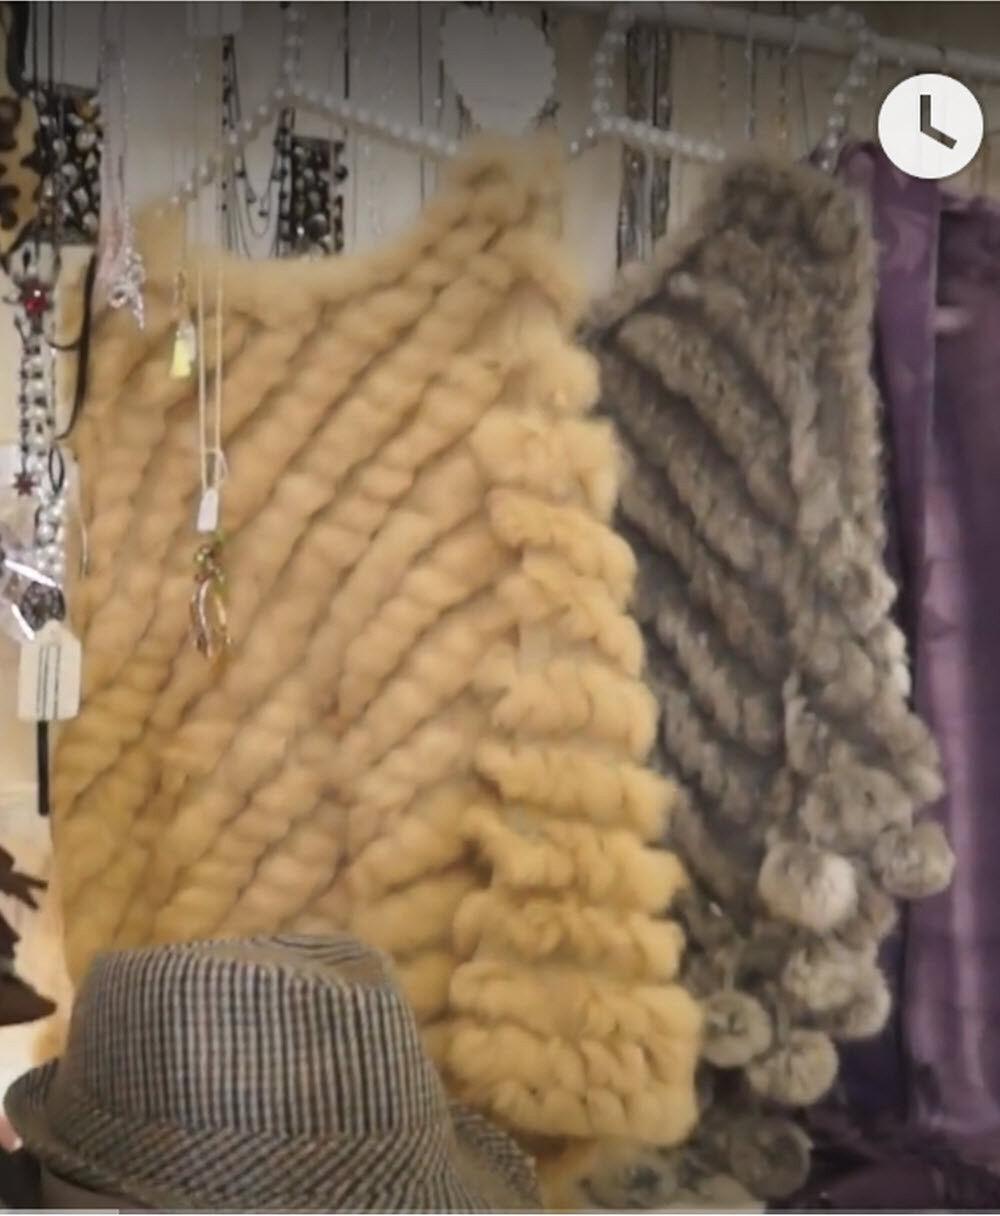 Coney Fur Poncho - Light braun - ( Genue Fur )